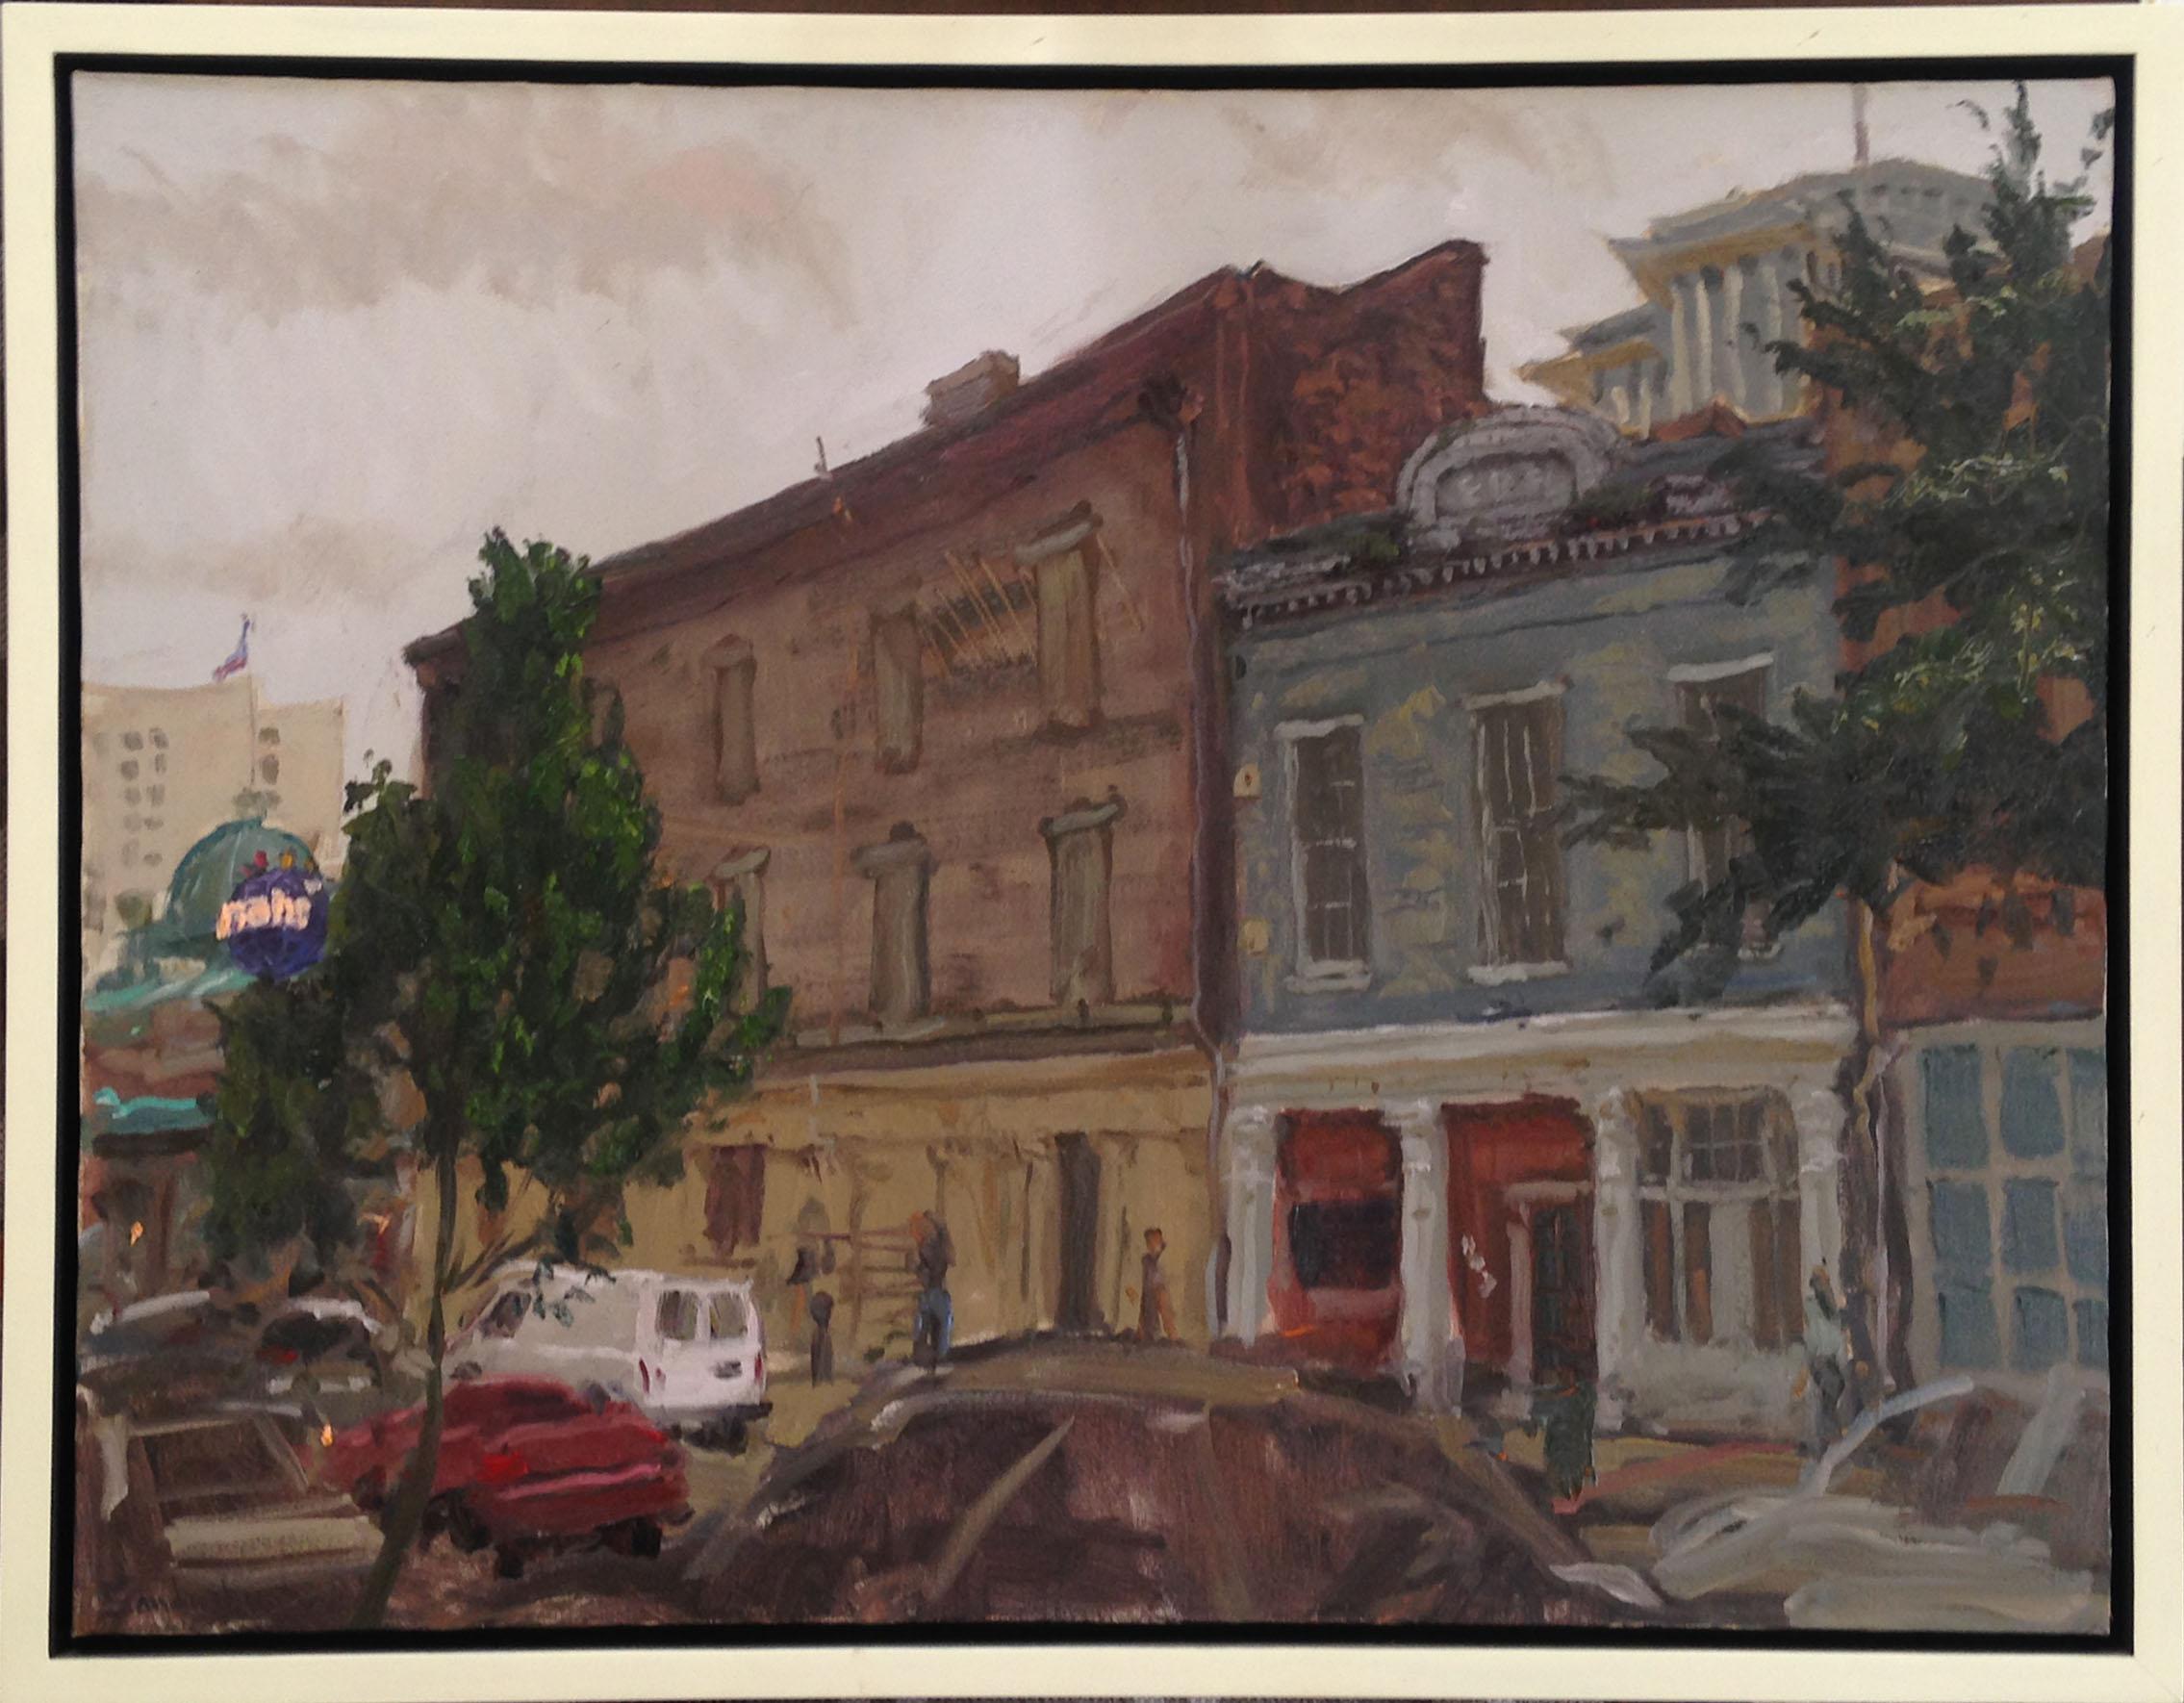 """In the Wake of Harrah's"" by Phil Sandusky, oil on canvas, 22""X28"", value: $2,750"